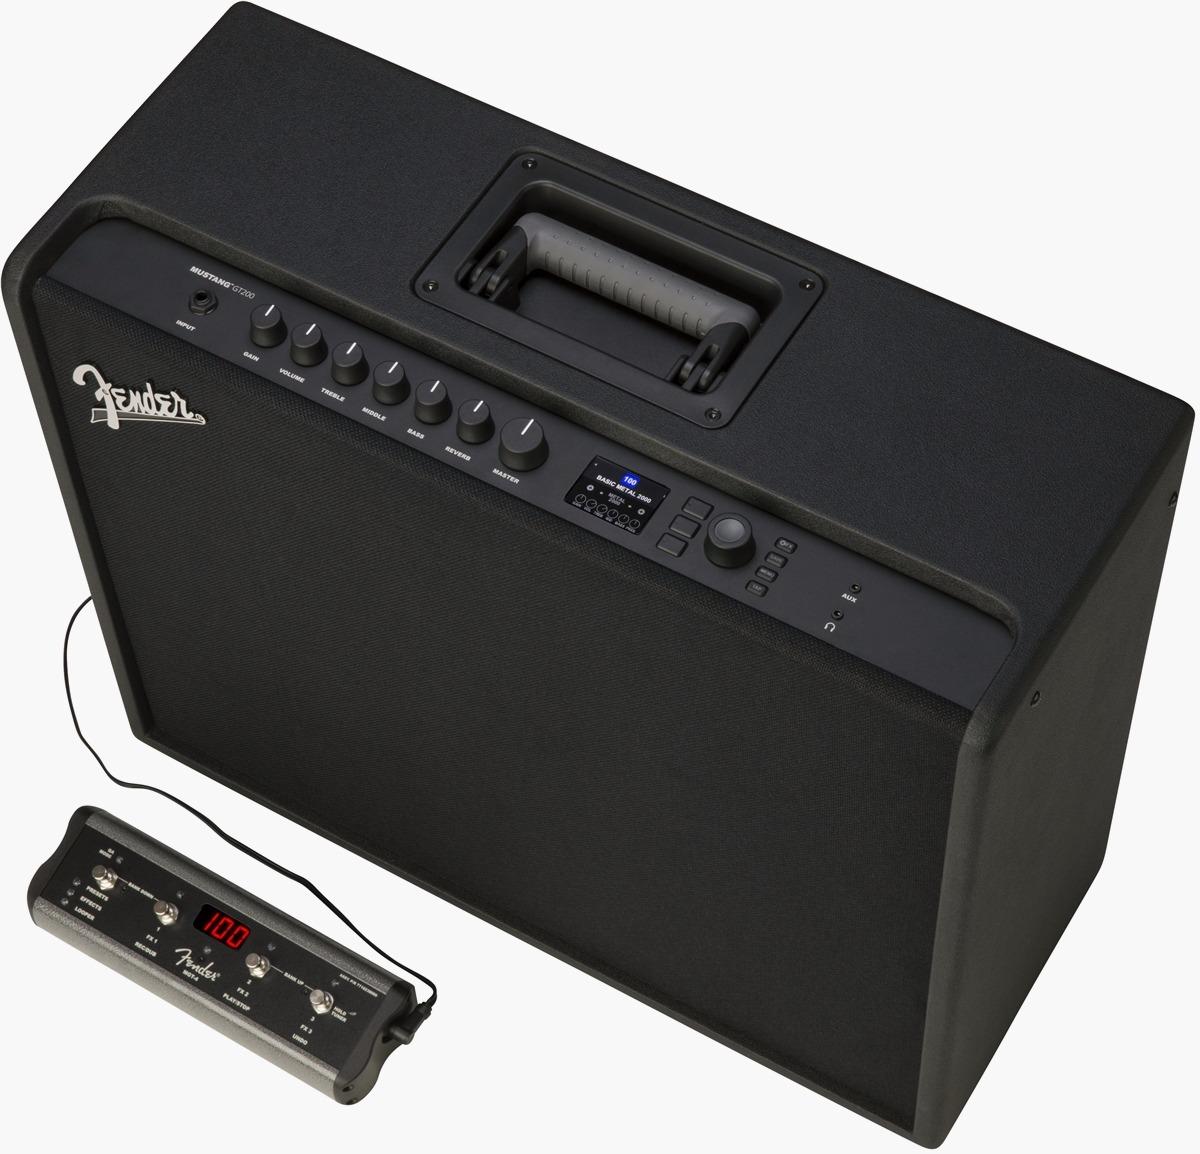 medium resolution of ethan 200 amp fuse box wiring library ethan 200 amp fuse box